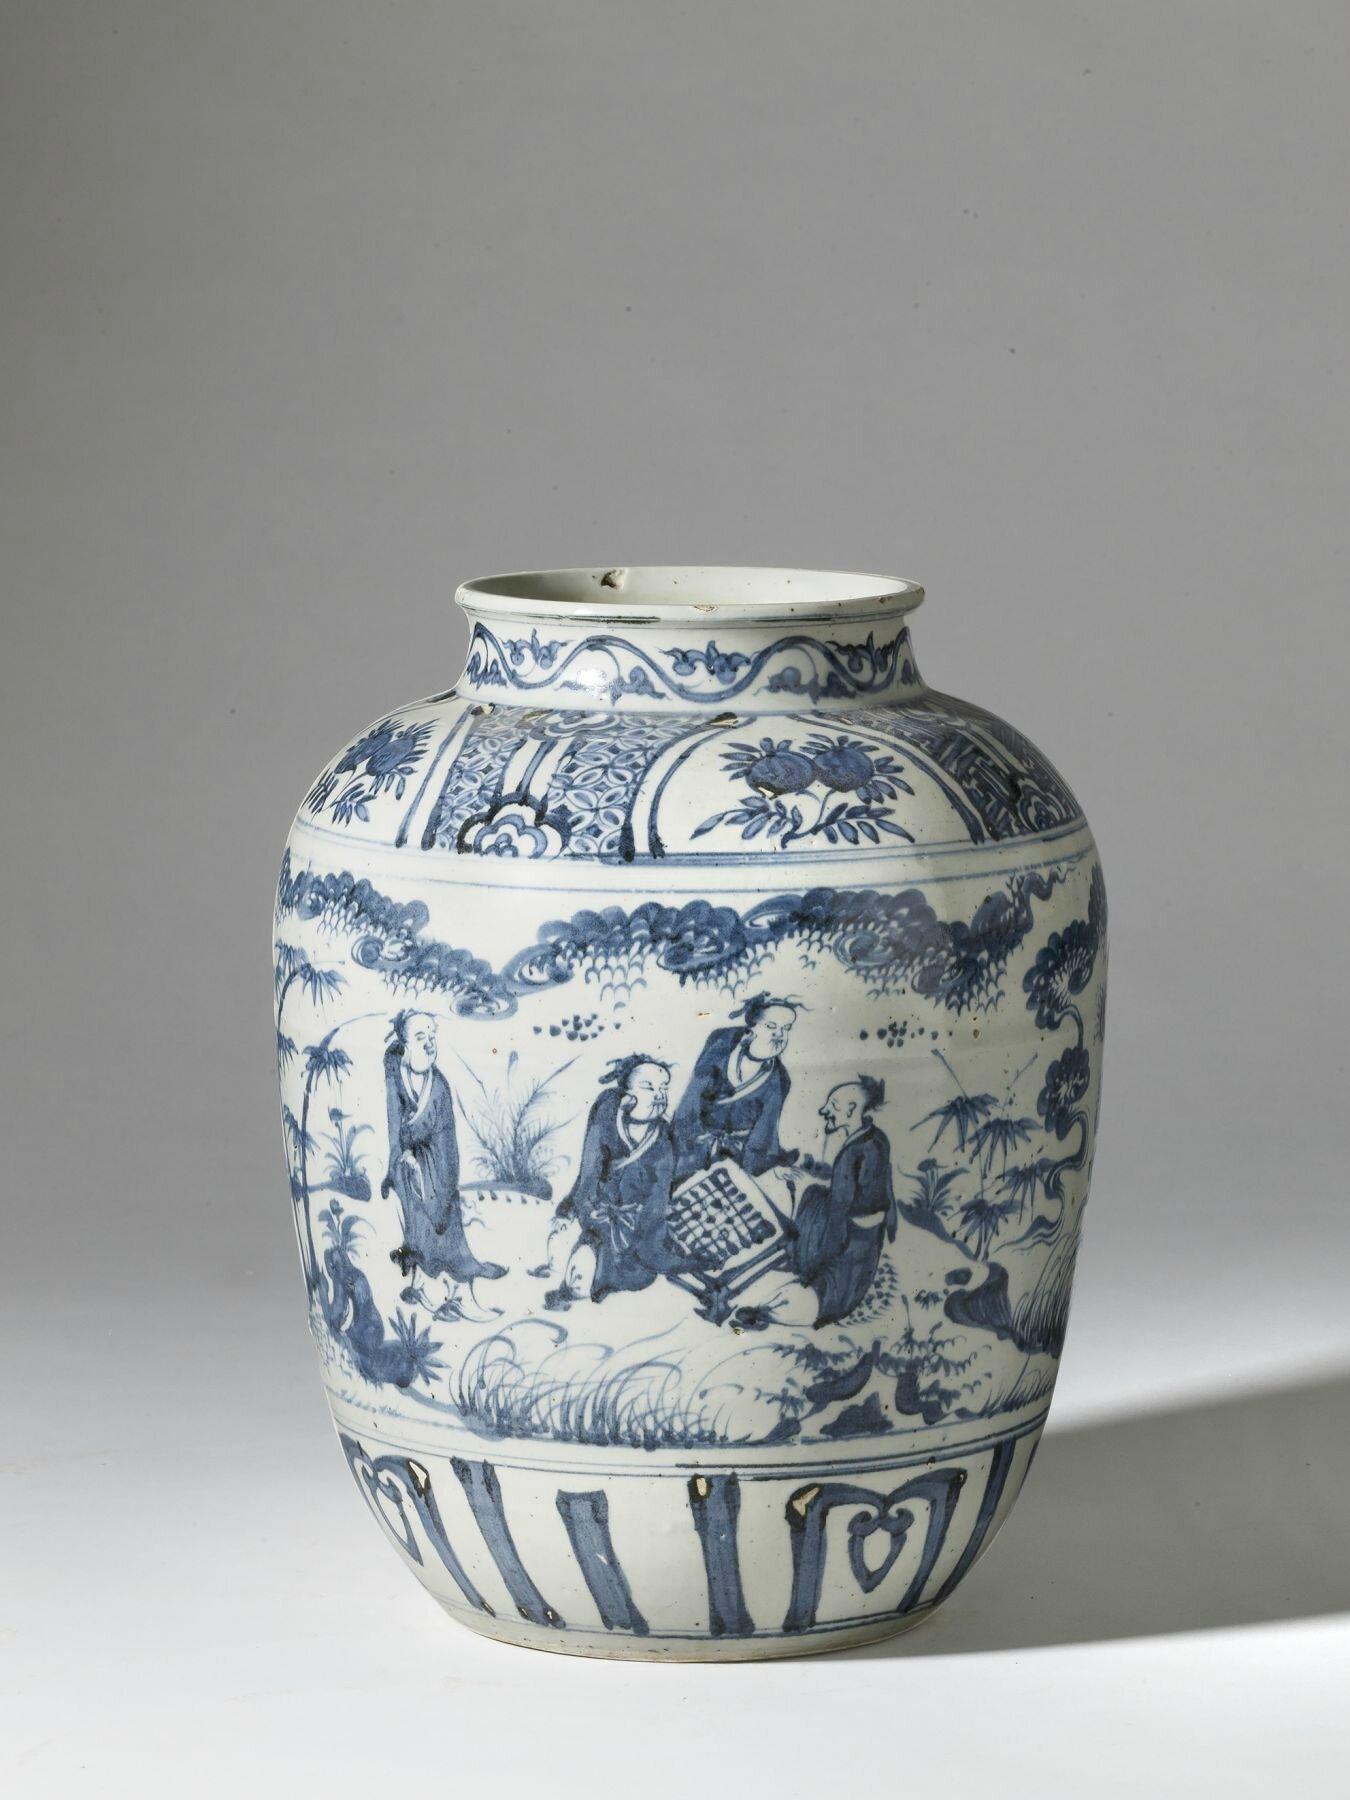 Grand vase en porcelaine bleu blanc, Chine, dynastie Ming, XVIe siècle